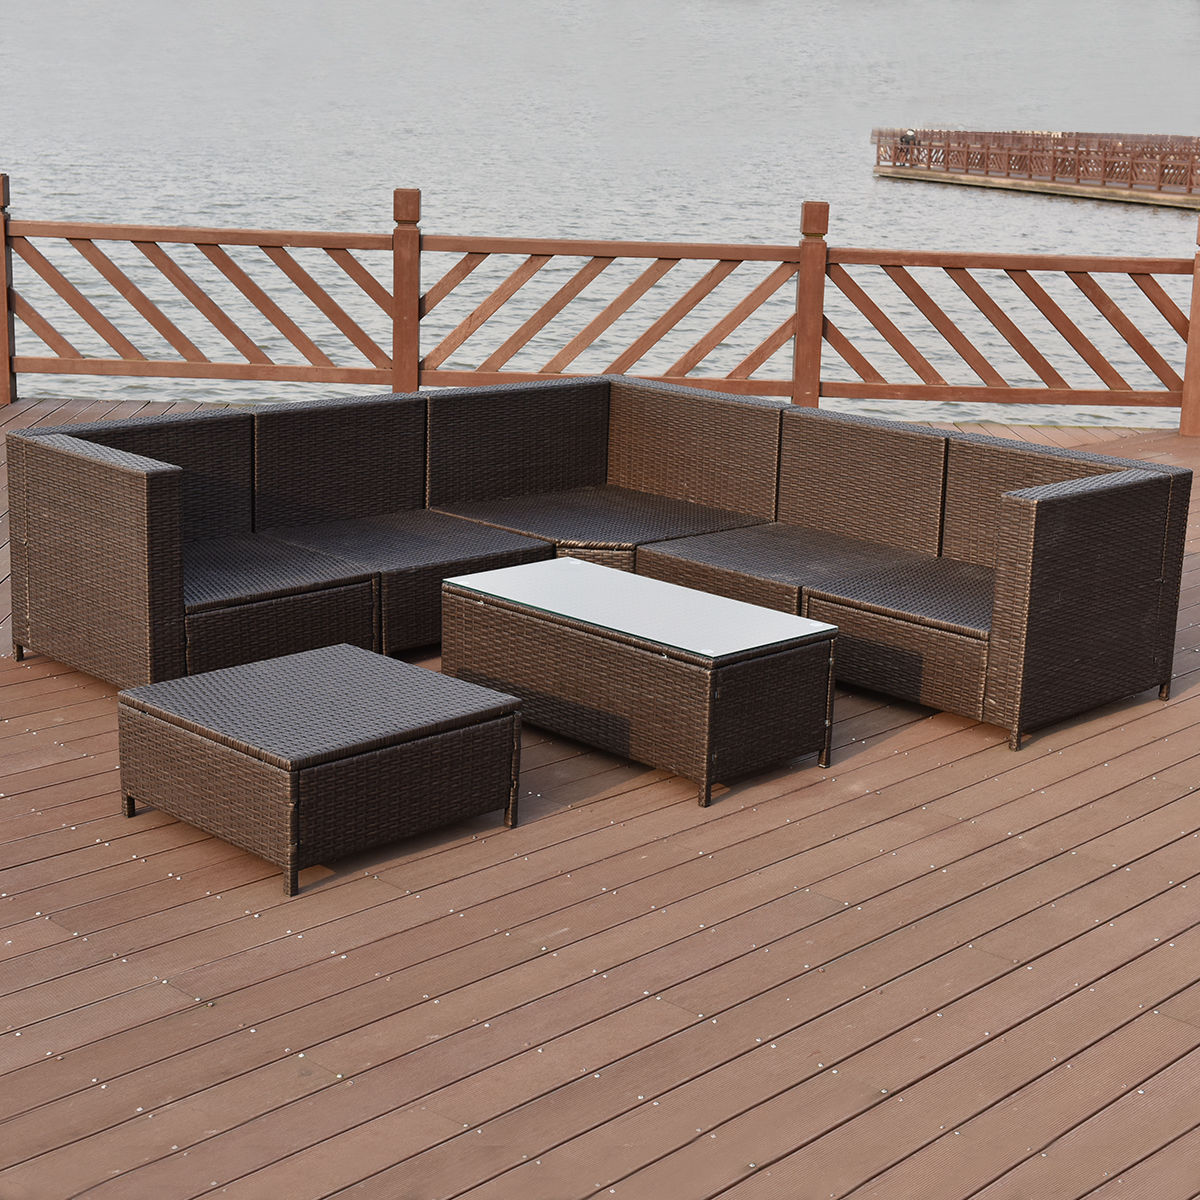 Costway 7 PCS Outdoor Rattan Wicker Furniture Set Sectional ...